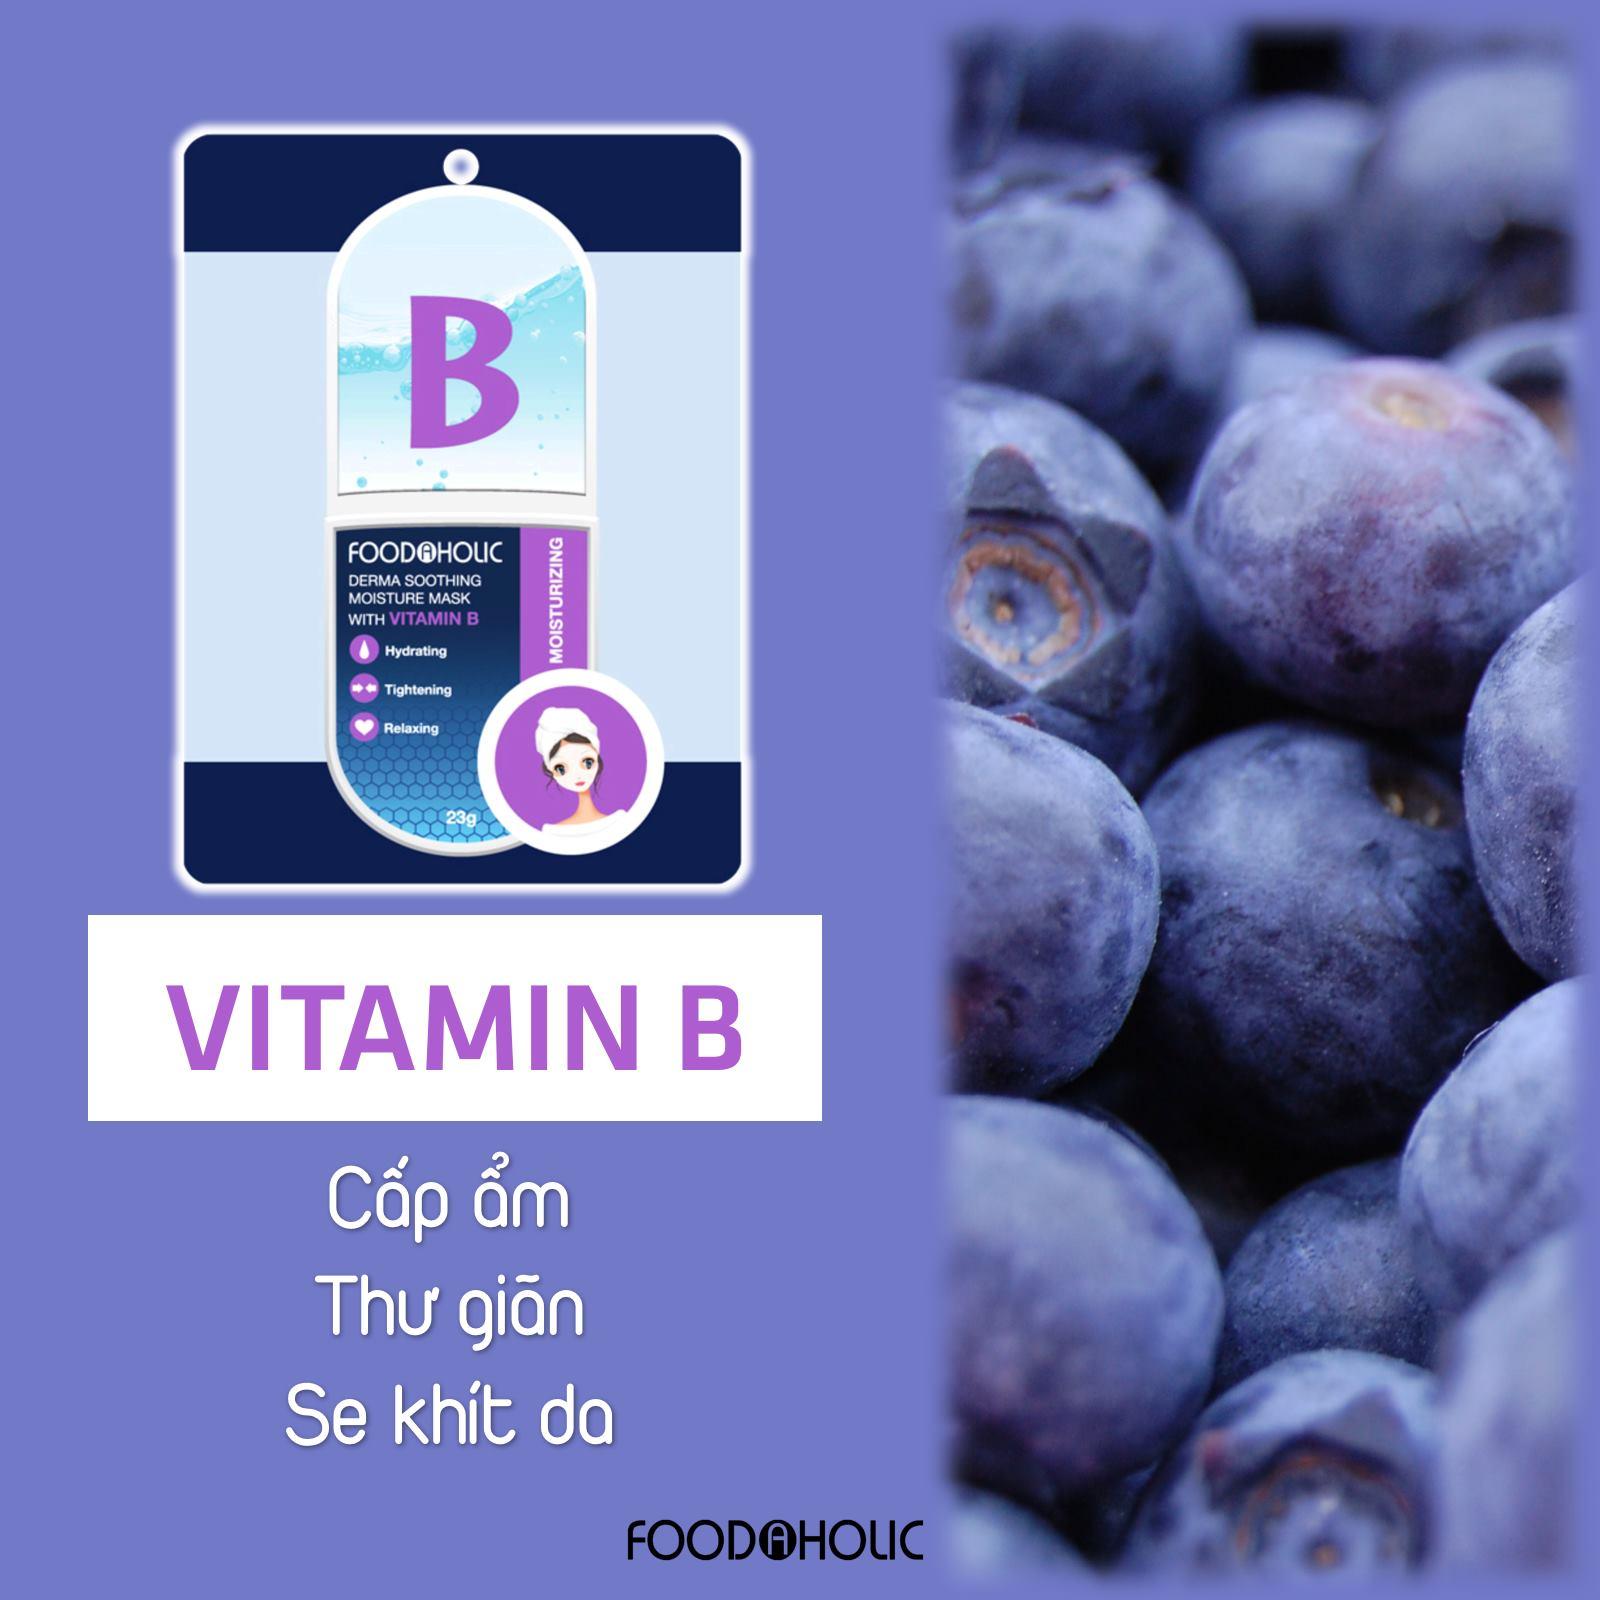 Combo 10 mặt nạ Vitamin dành cho da mụn (Vitamin B,D,E,K) 3D Foodaholic Essential 23g